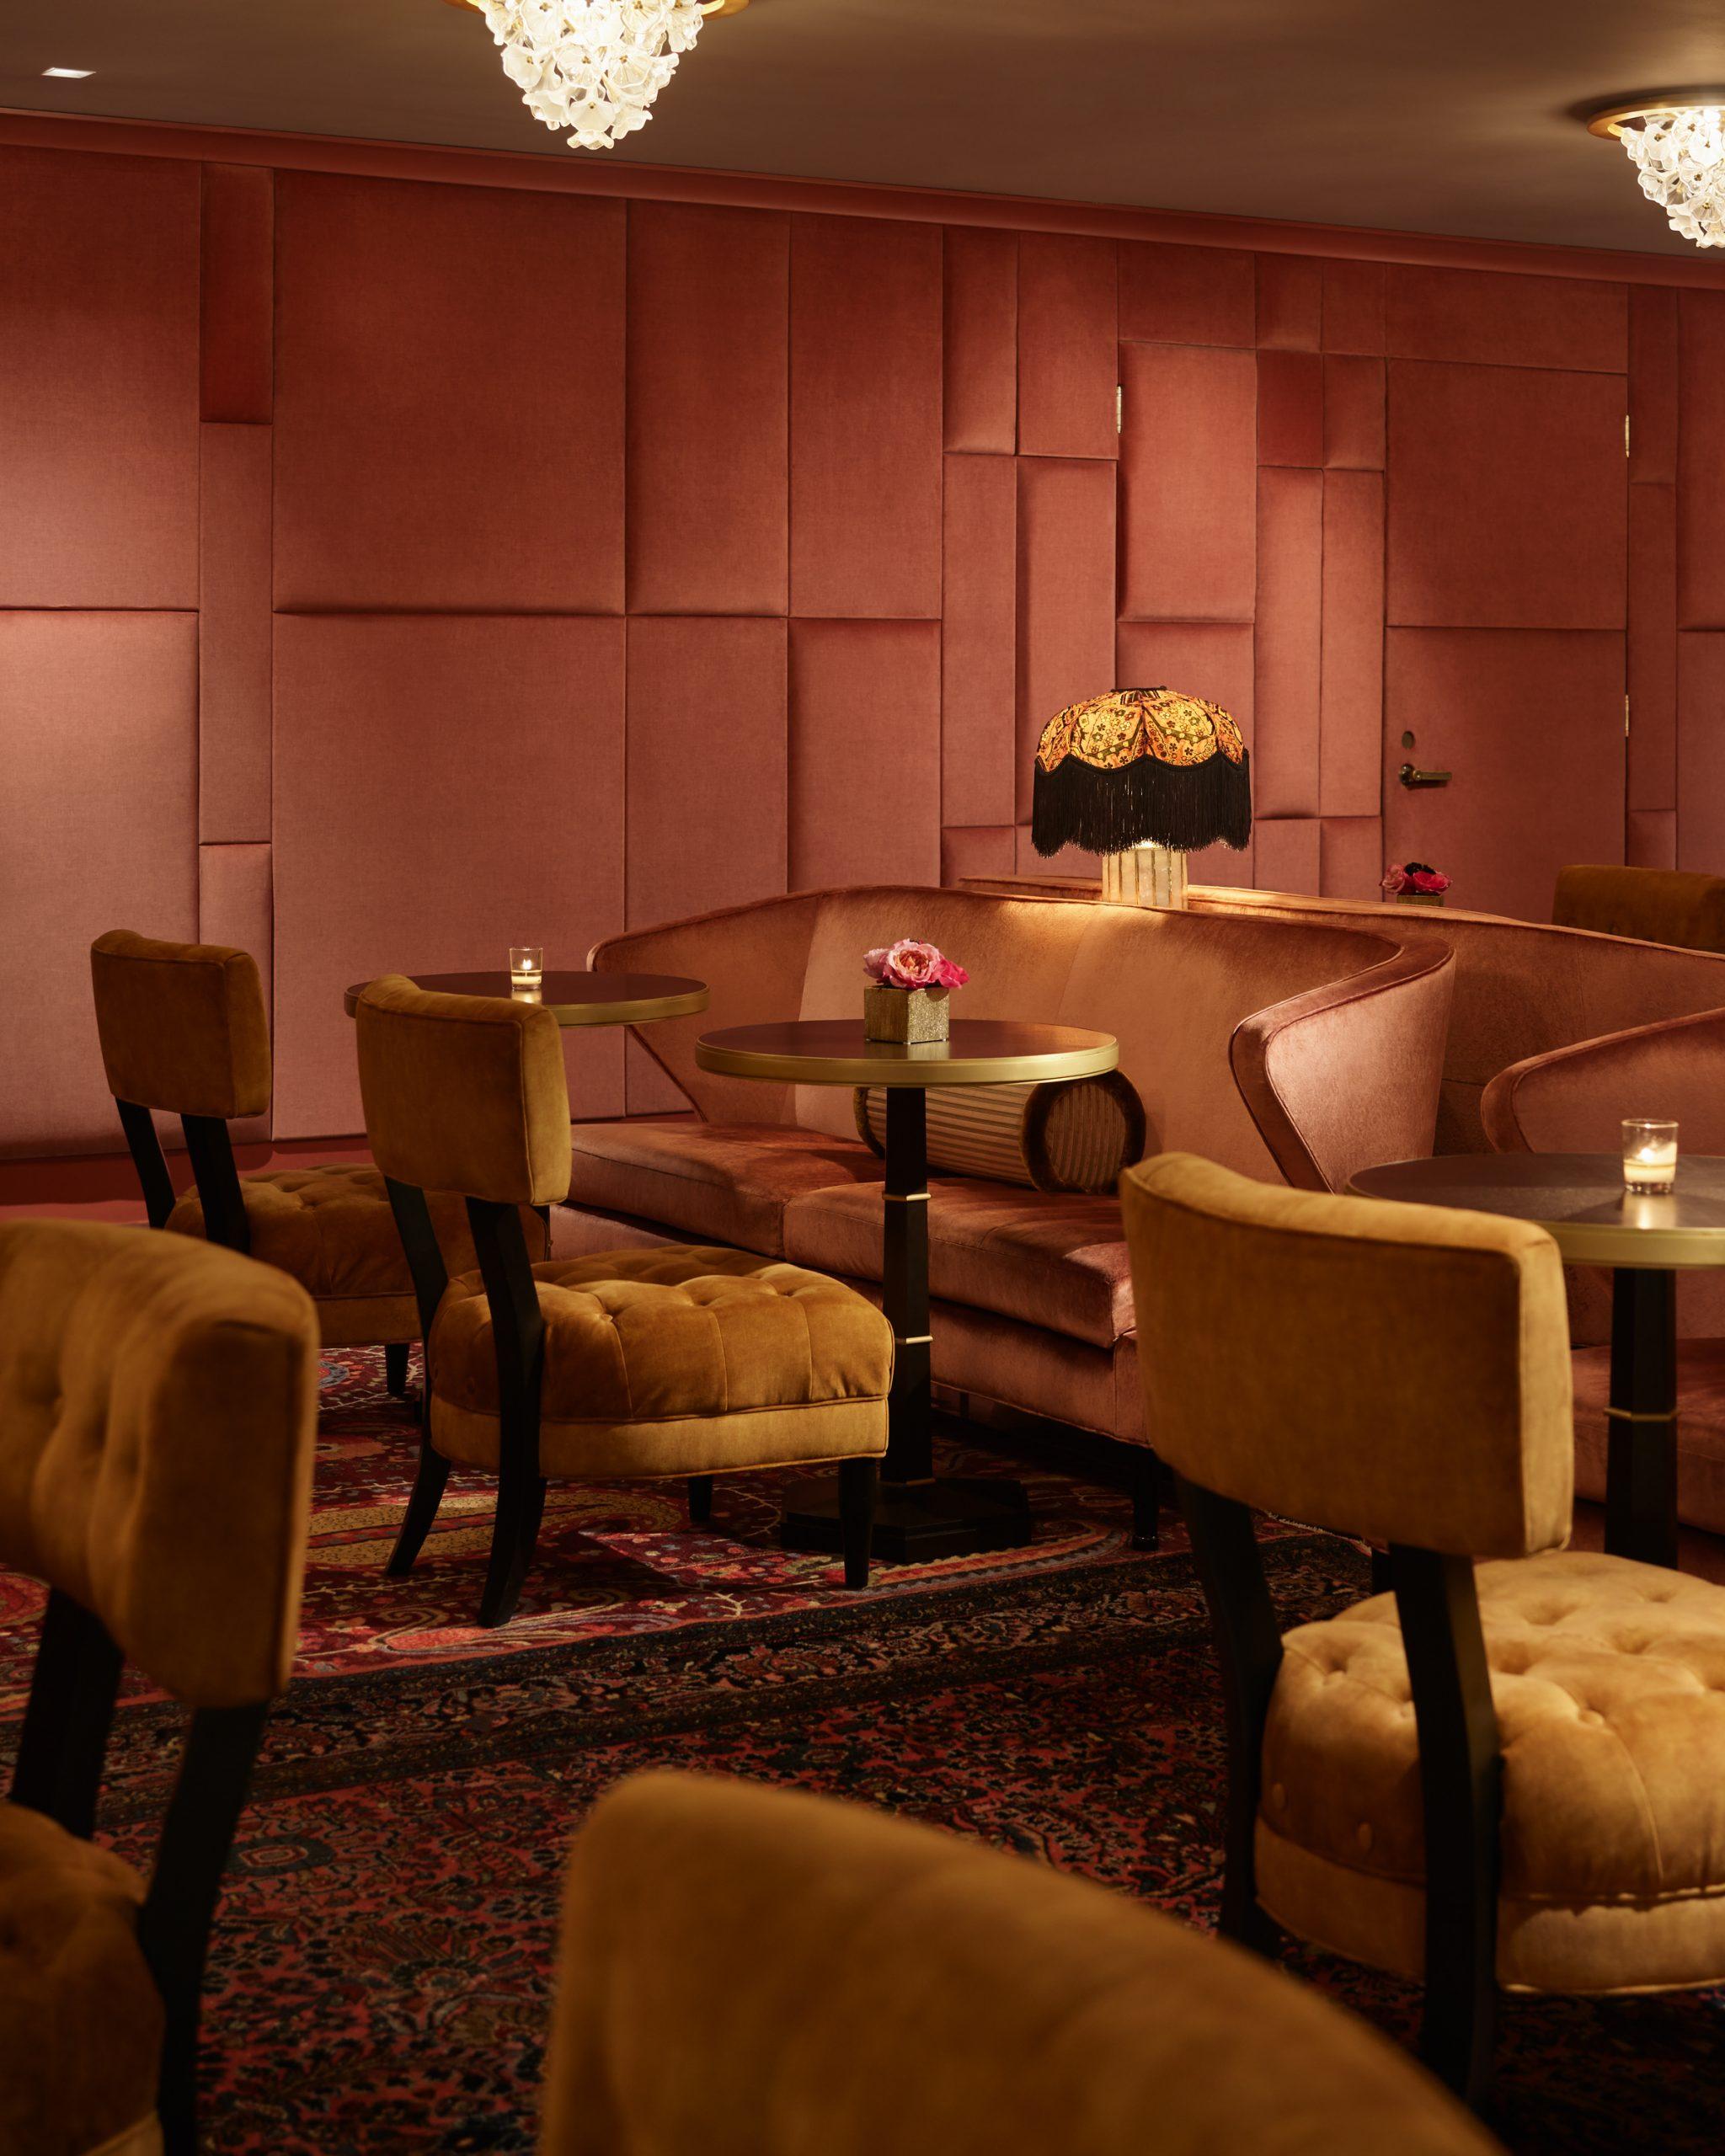 Monarch & Kessaku Restaurants